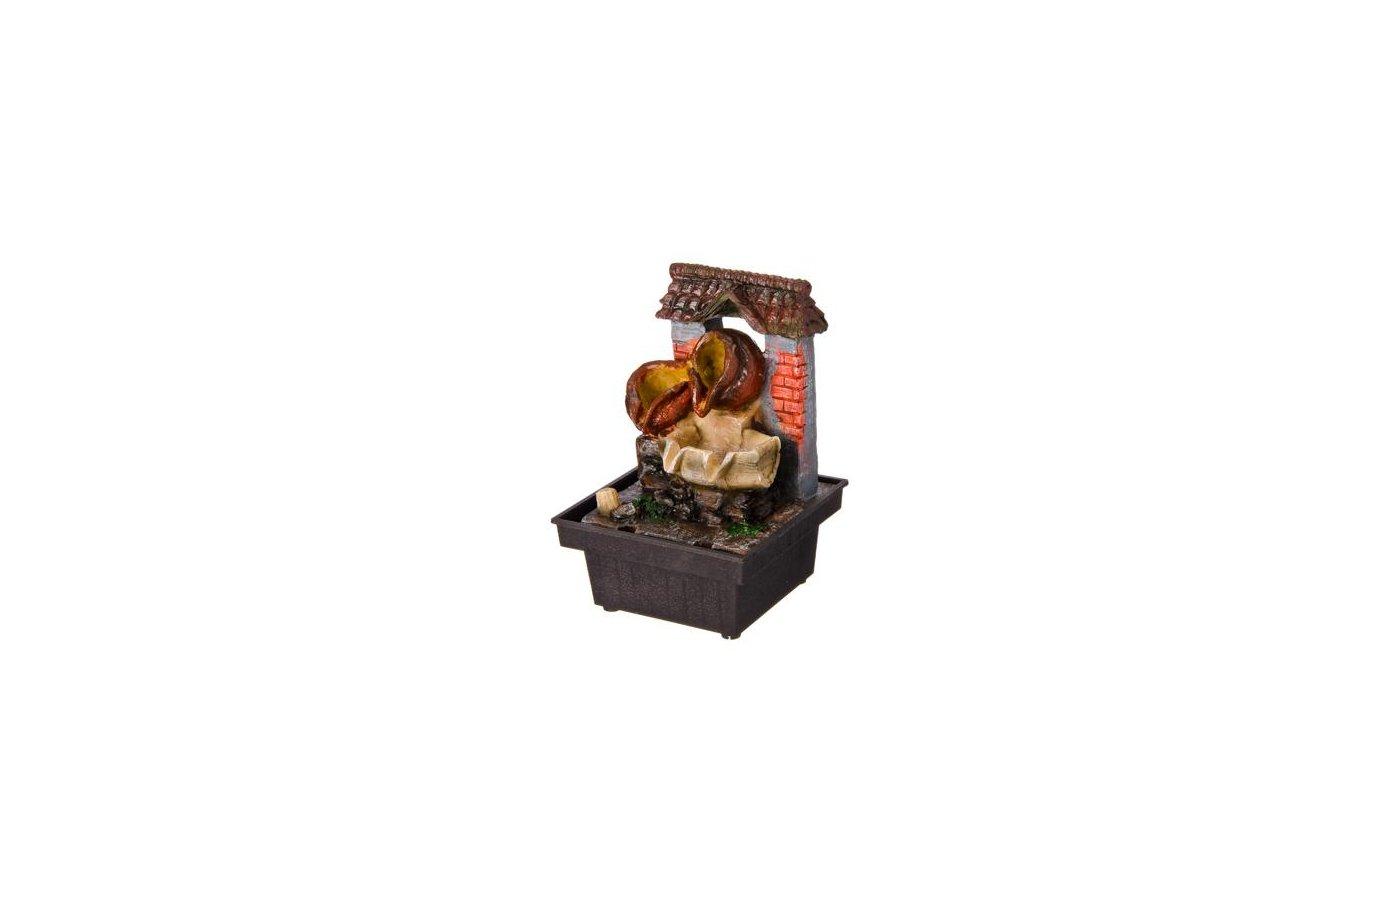 садовые товары Фонтан с двумя горшками 18х14х10.5см 515-007